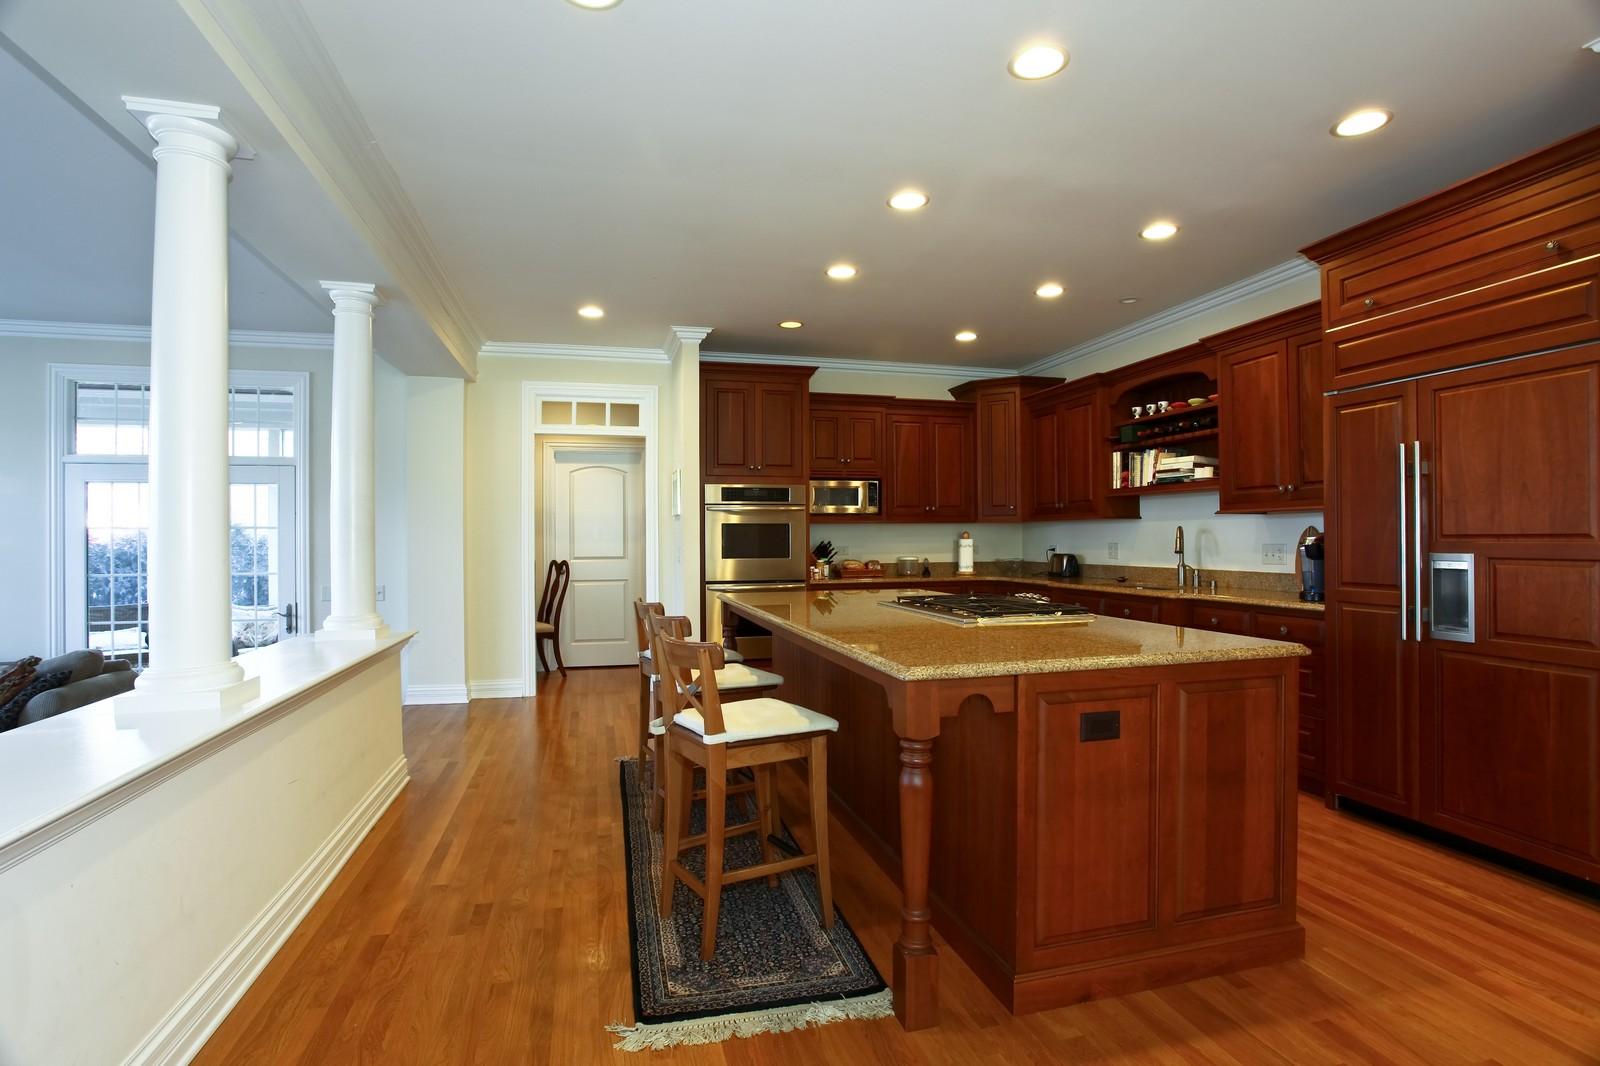 Real Estate Photography - 663 N Webster Street, Naperville, IL, 60563 - Kitchen